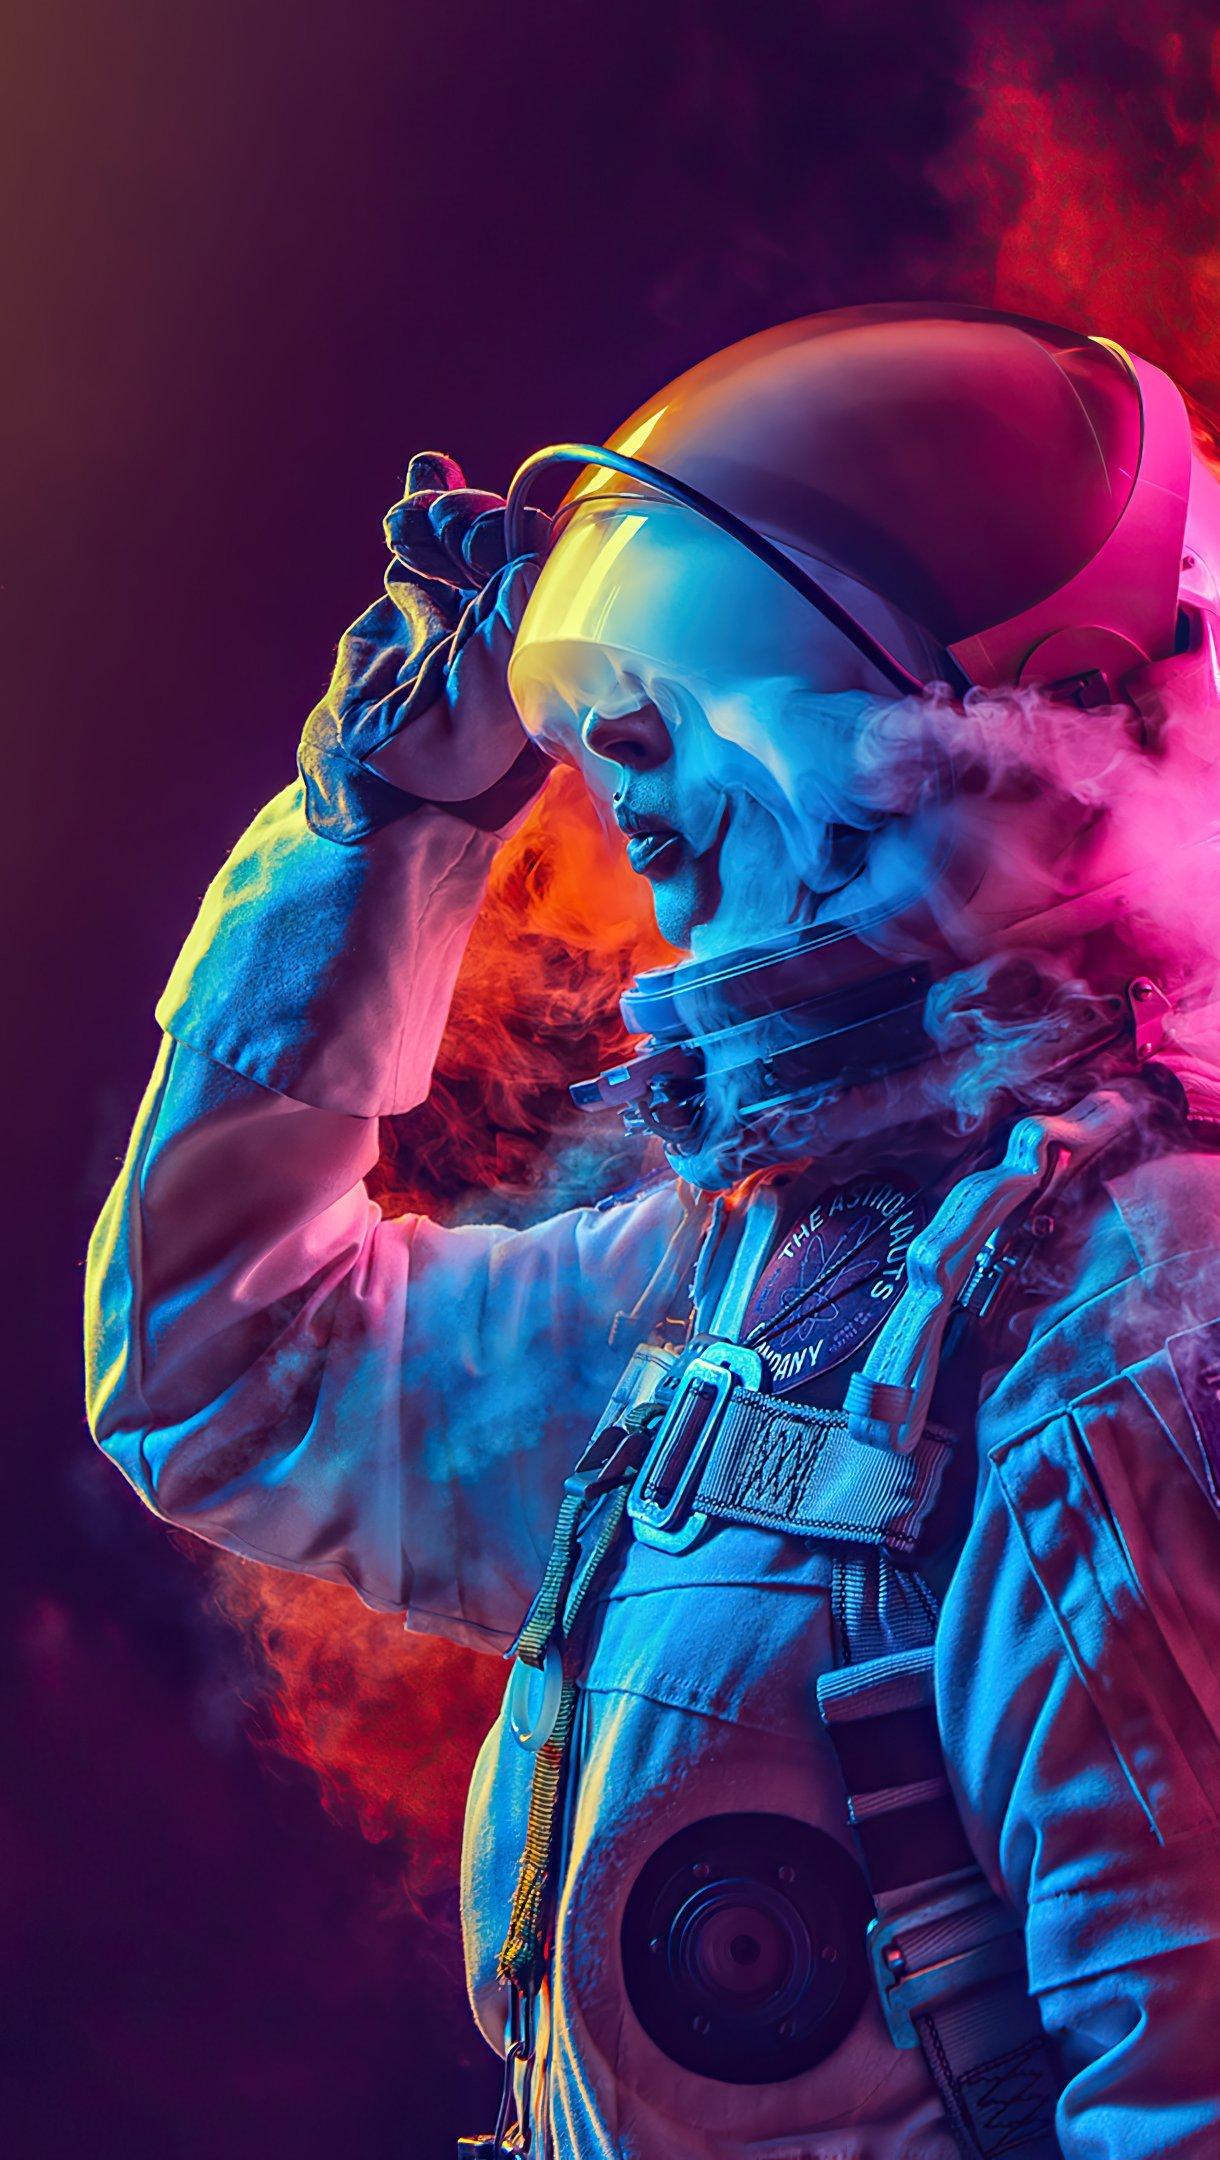 Fondos de pantalla Astronauta entre humo de colores Vertical